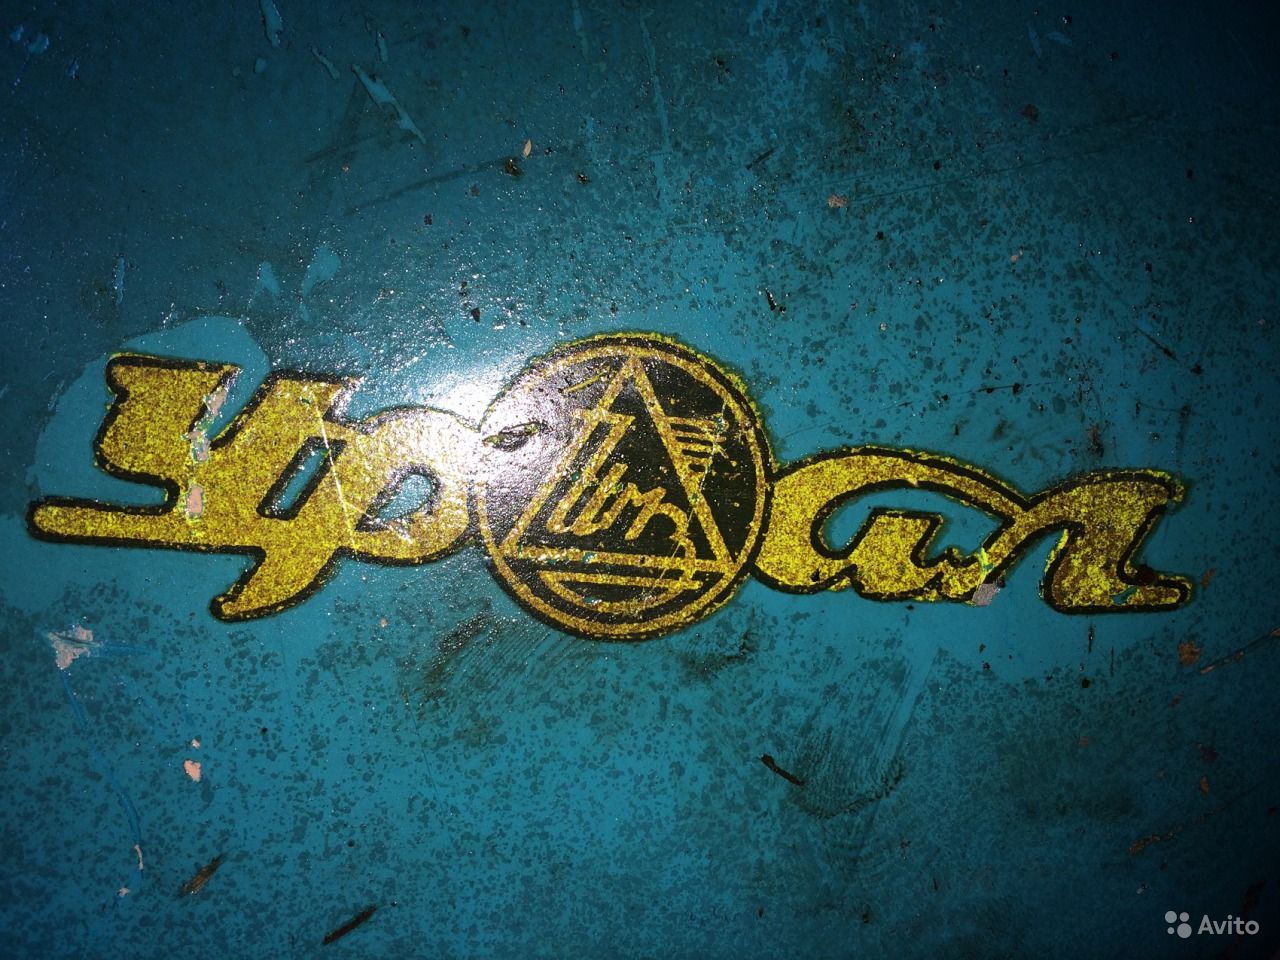 Продам бензобак и крыло от мотоциклов Урал М-62, М-63 форум: http://moto-planeta.ru/forum/topic_6681/